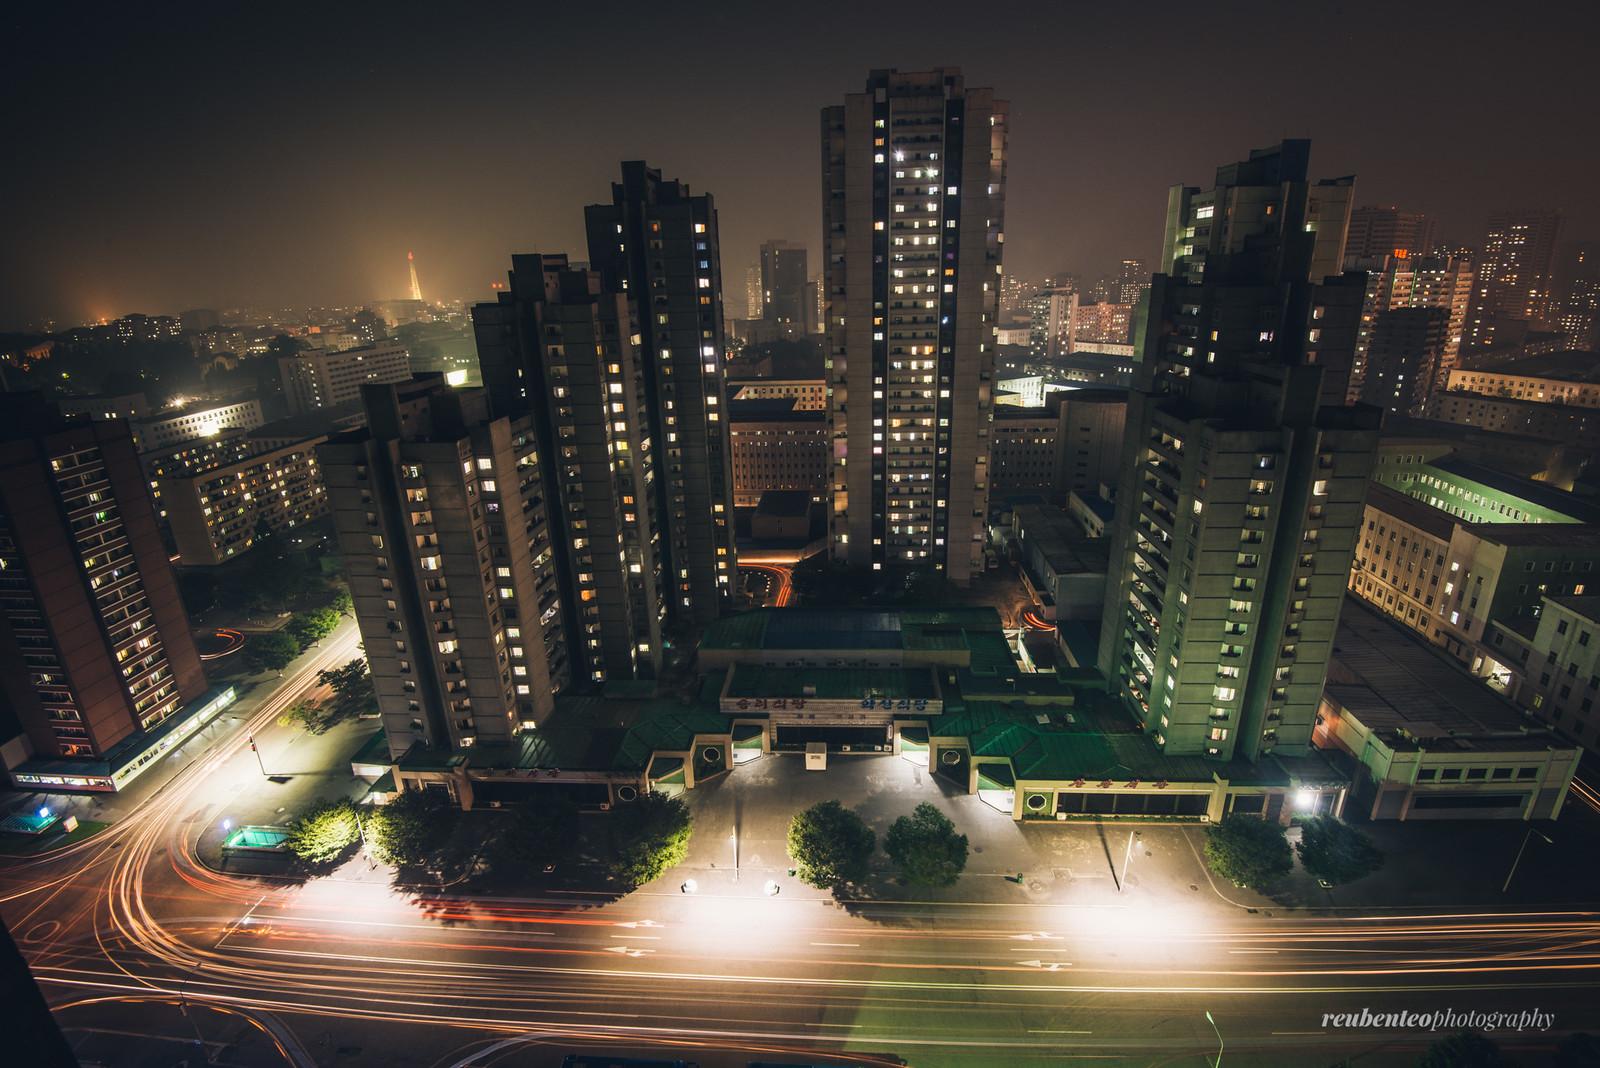 Pyongyang Night View